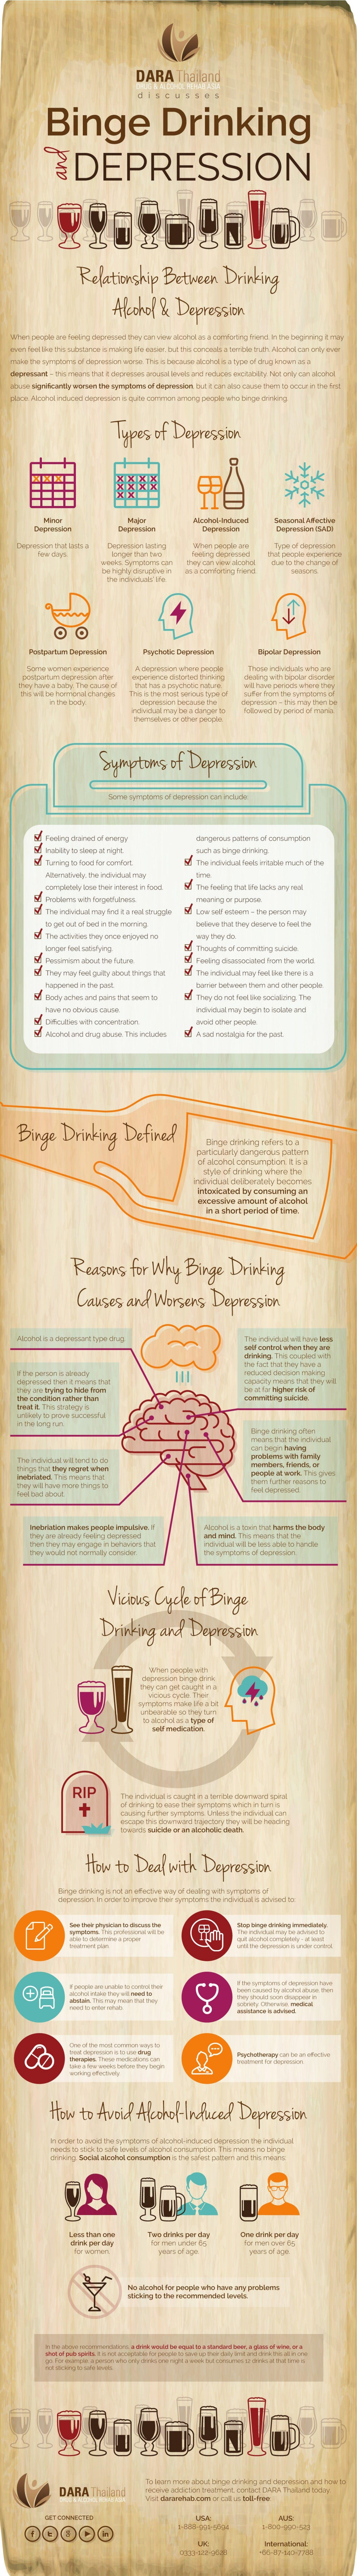 Binge Drinking And Depression Infographic Addictions Pinterest